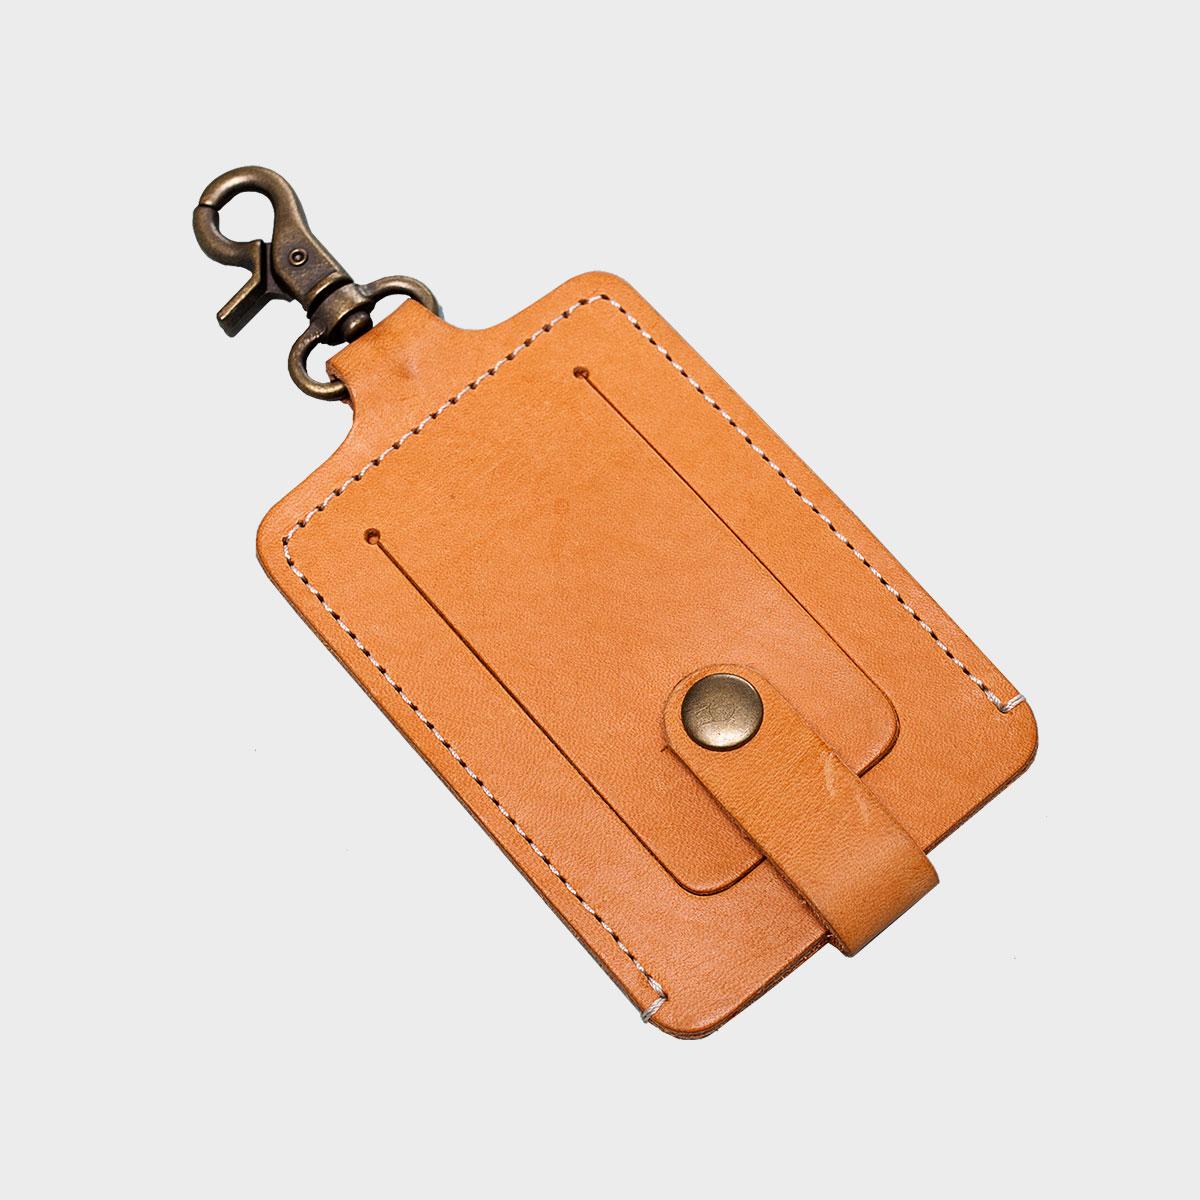 悠遊卡夾EasyCard Holder NT$ 1,280  HDB2010